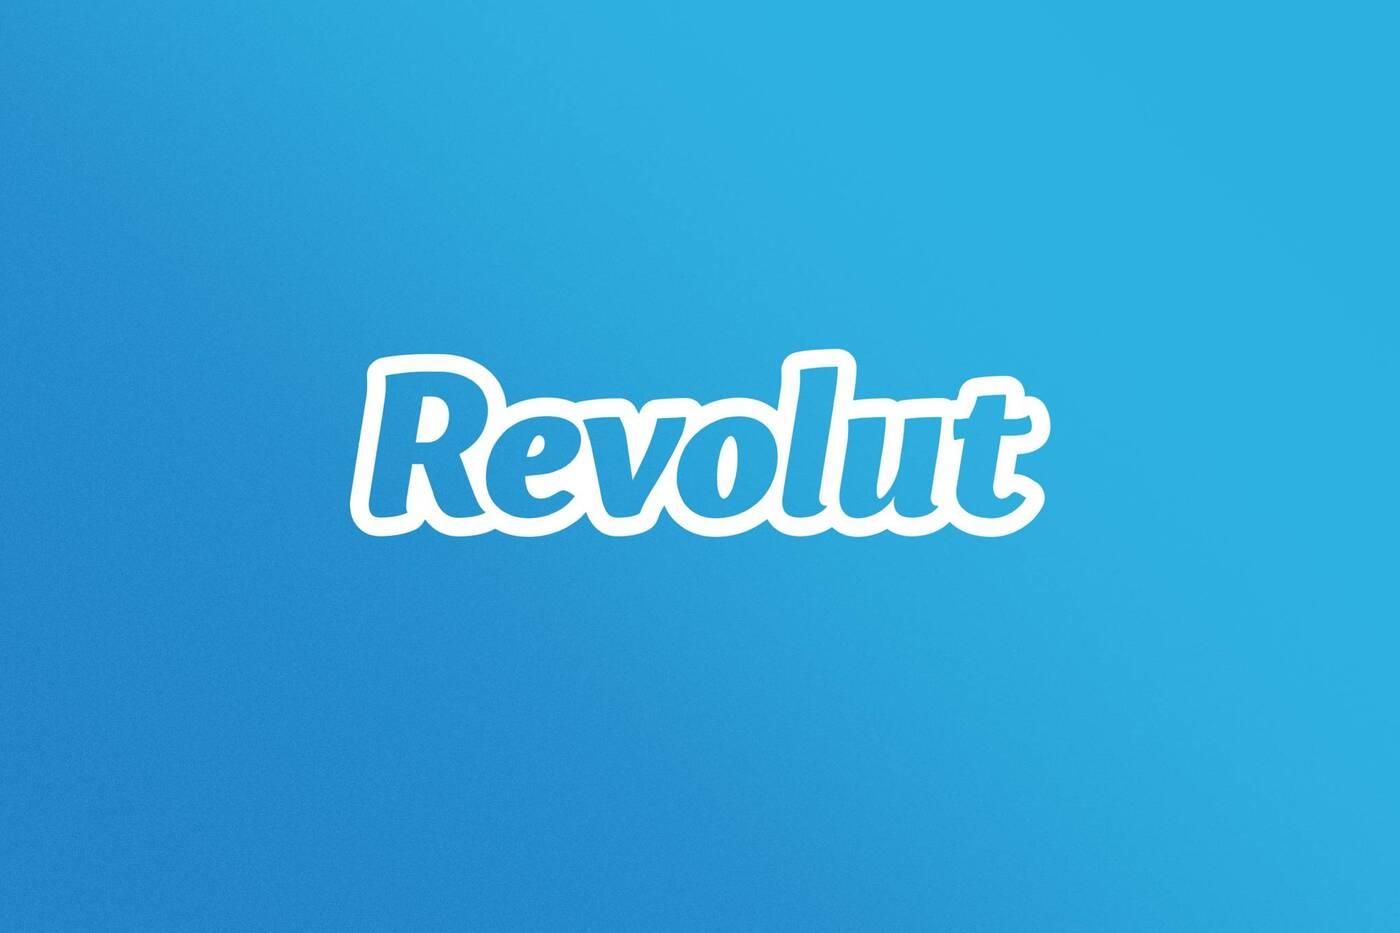 promocja revolut, zakładanie revolut, 15 zł revolut